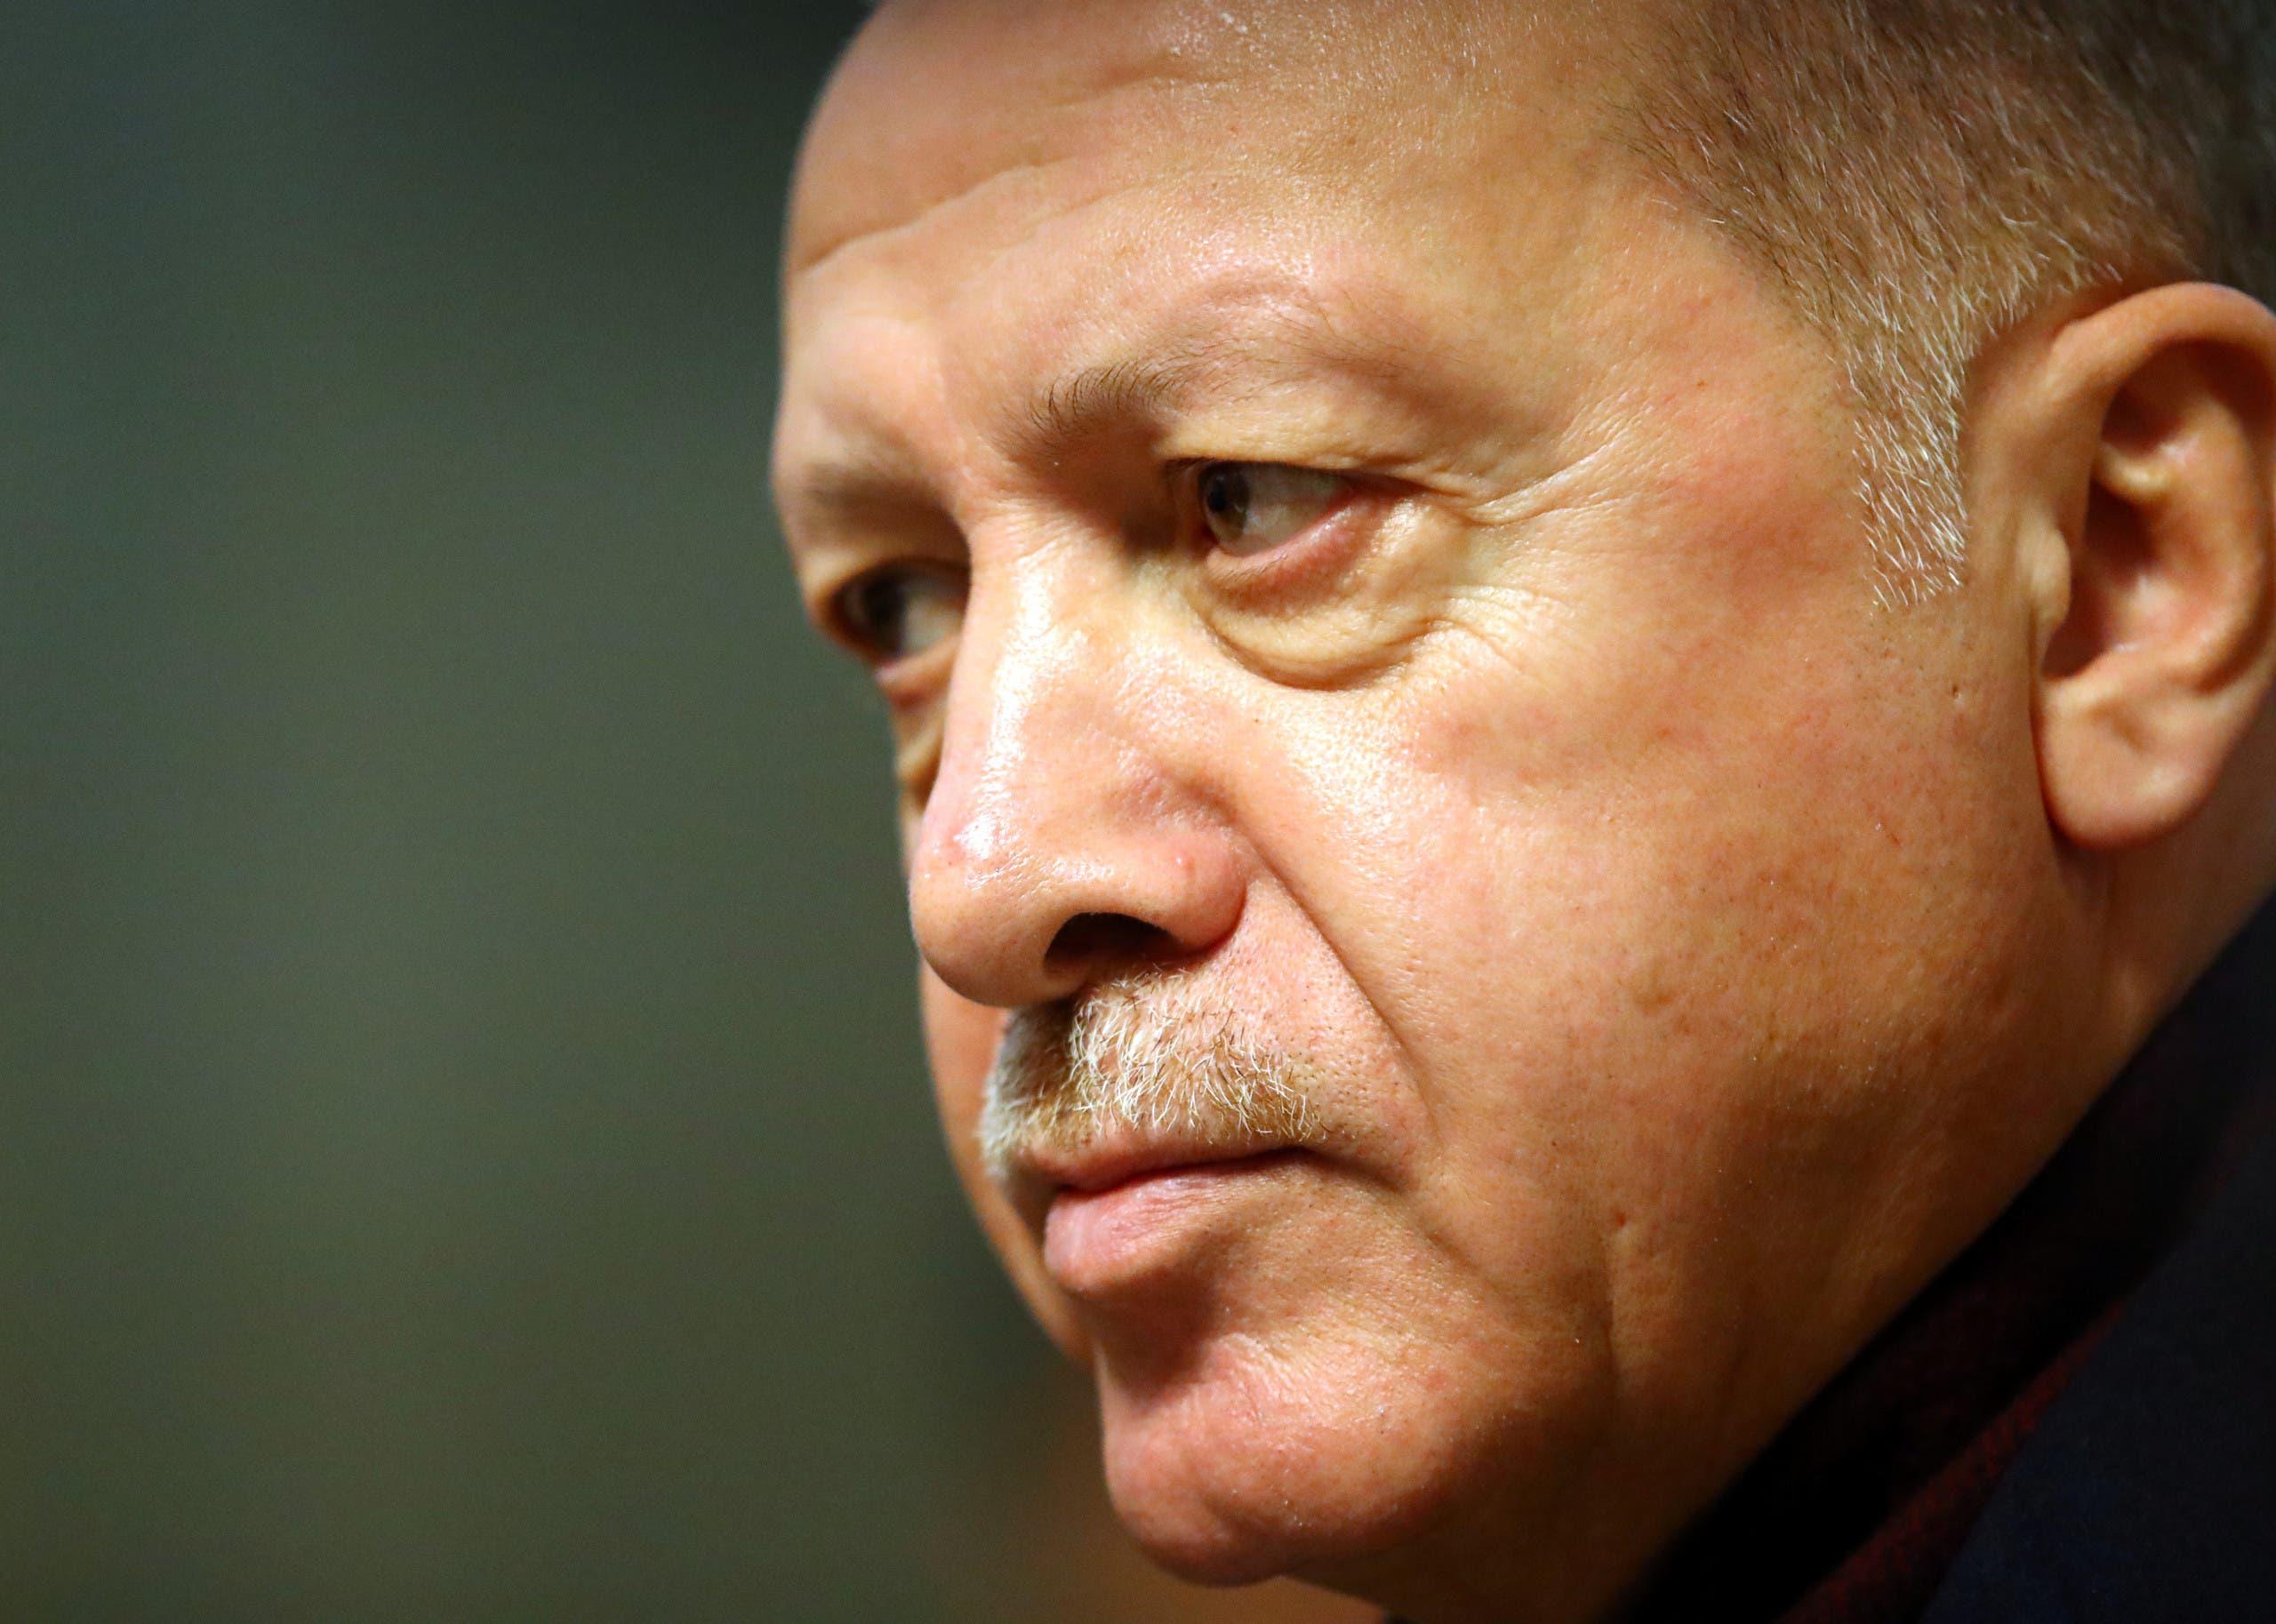 Turkey's President Recep Tayyip Erdogan. (File photo: Reuters)